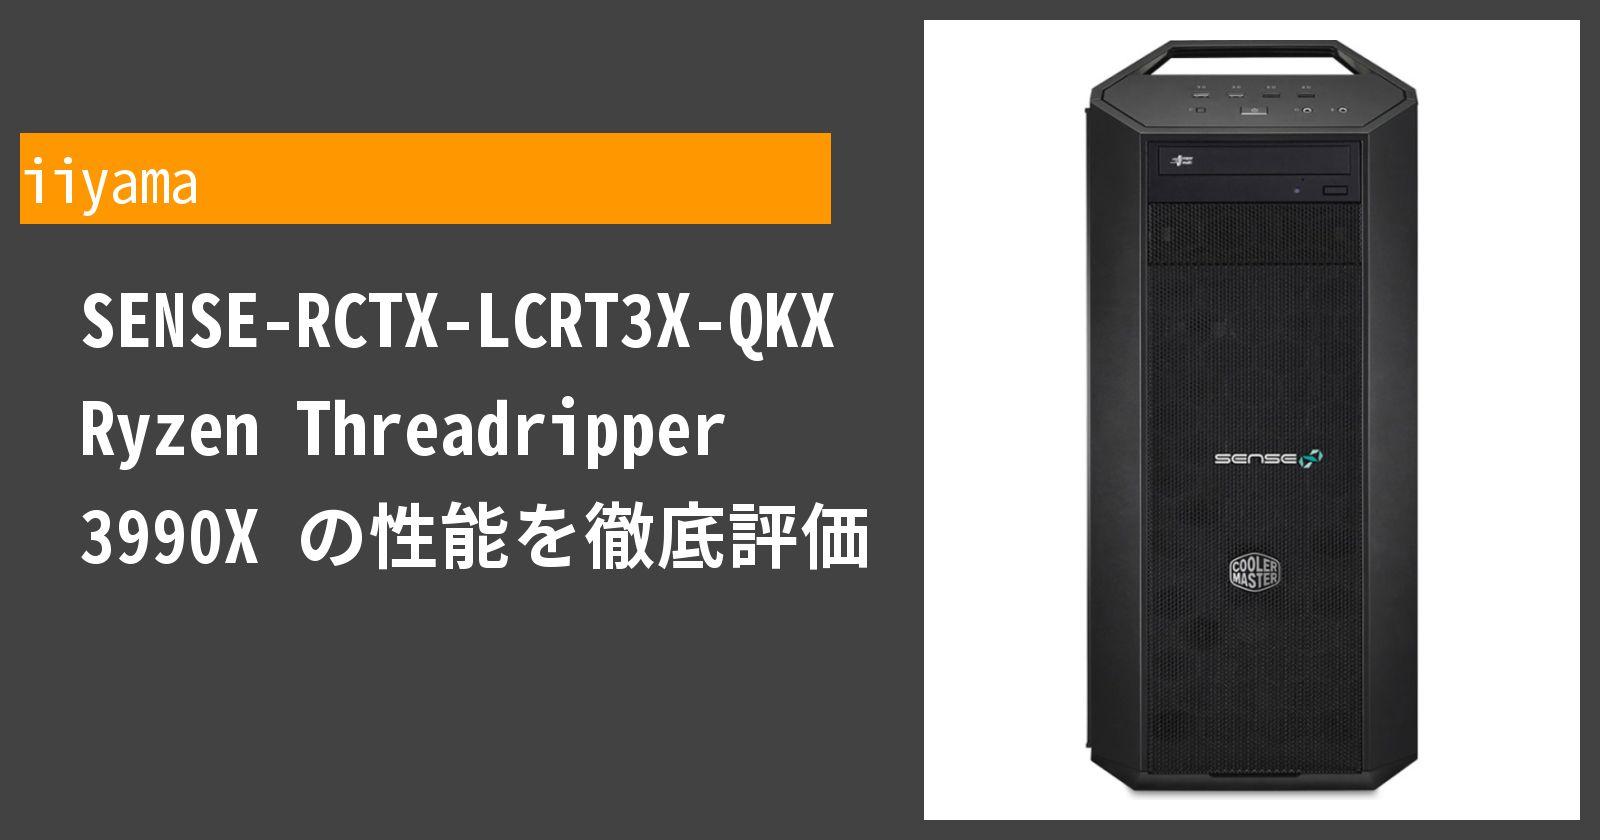 SENSE-RCTX-LCRT3X-QKX Ryzen Threadripper 3990X の性能を徹底評価